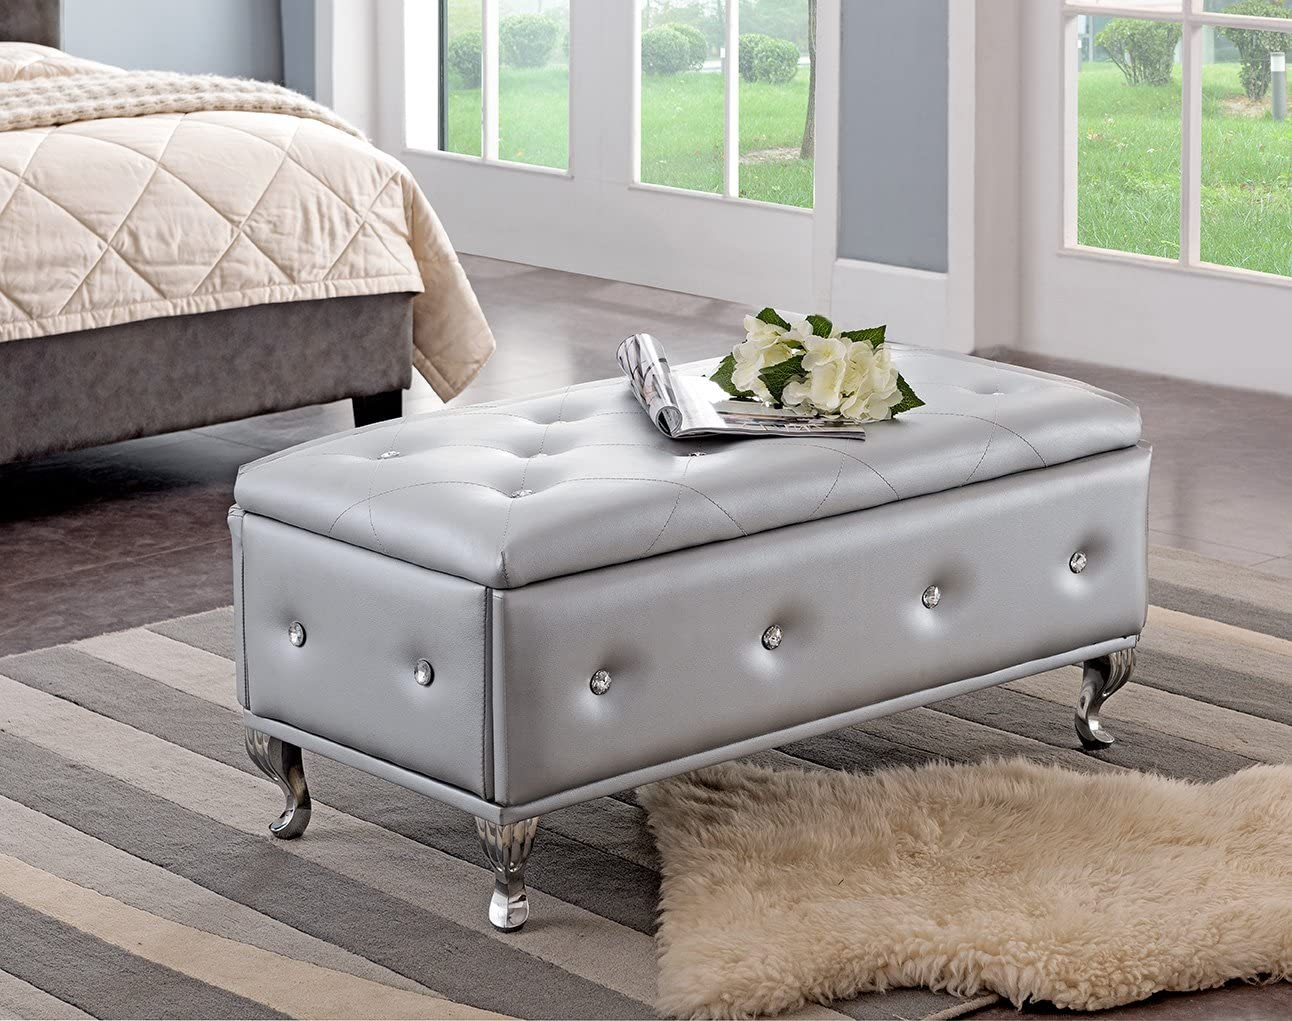 Kings Brand Furniture Silver Vinyl Tufted Design Upholstered Storage Bench Ottoman